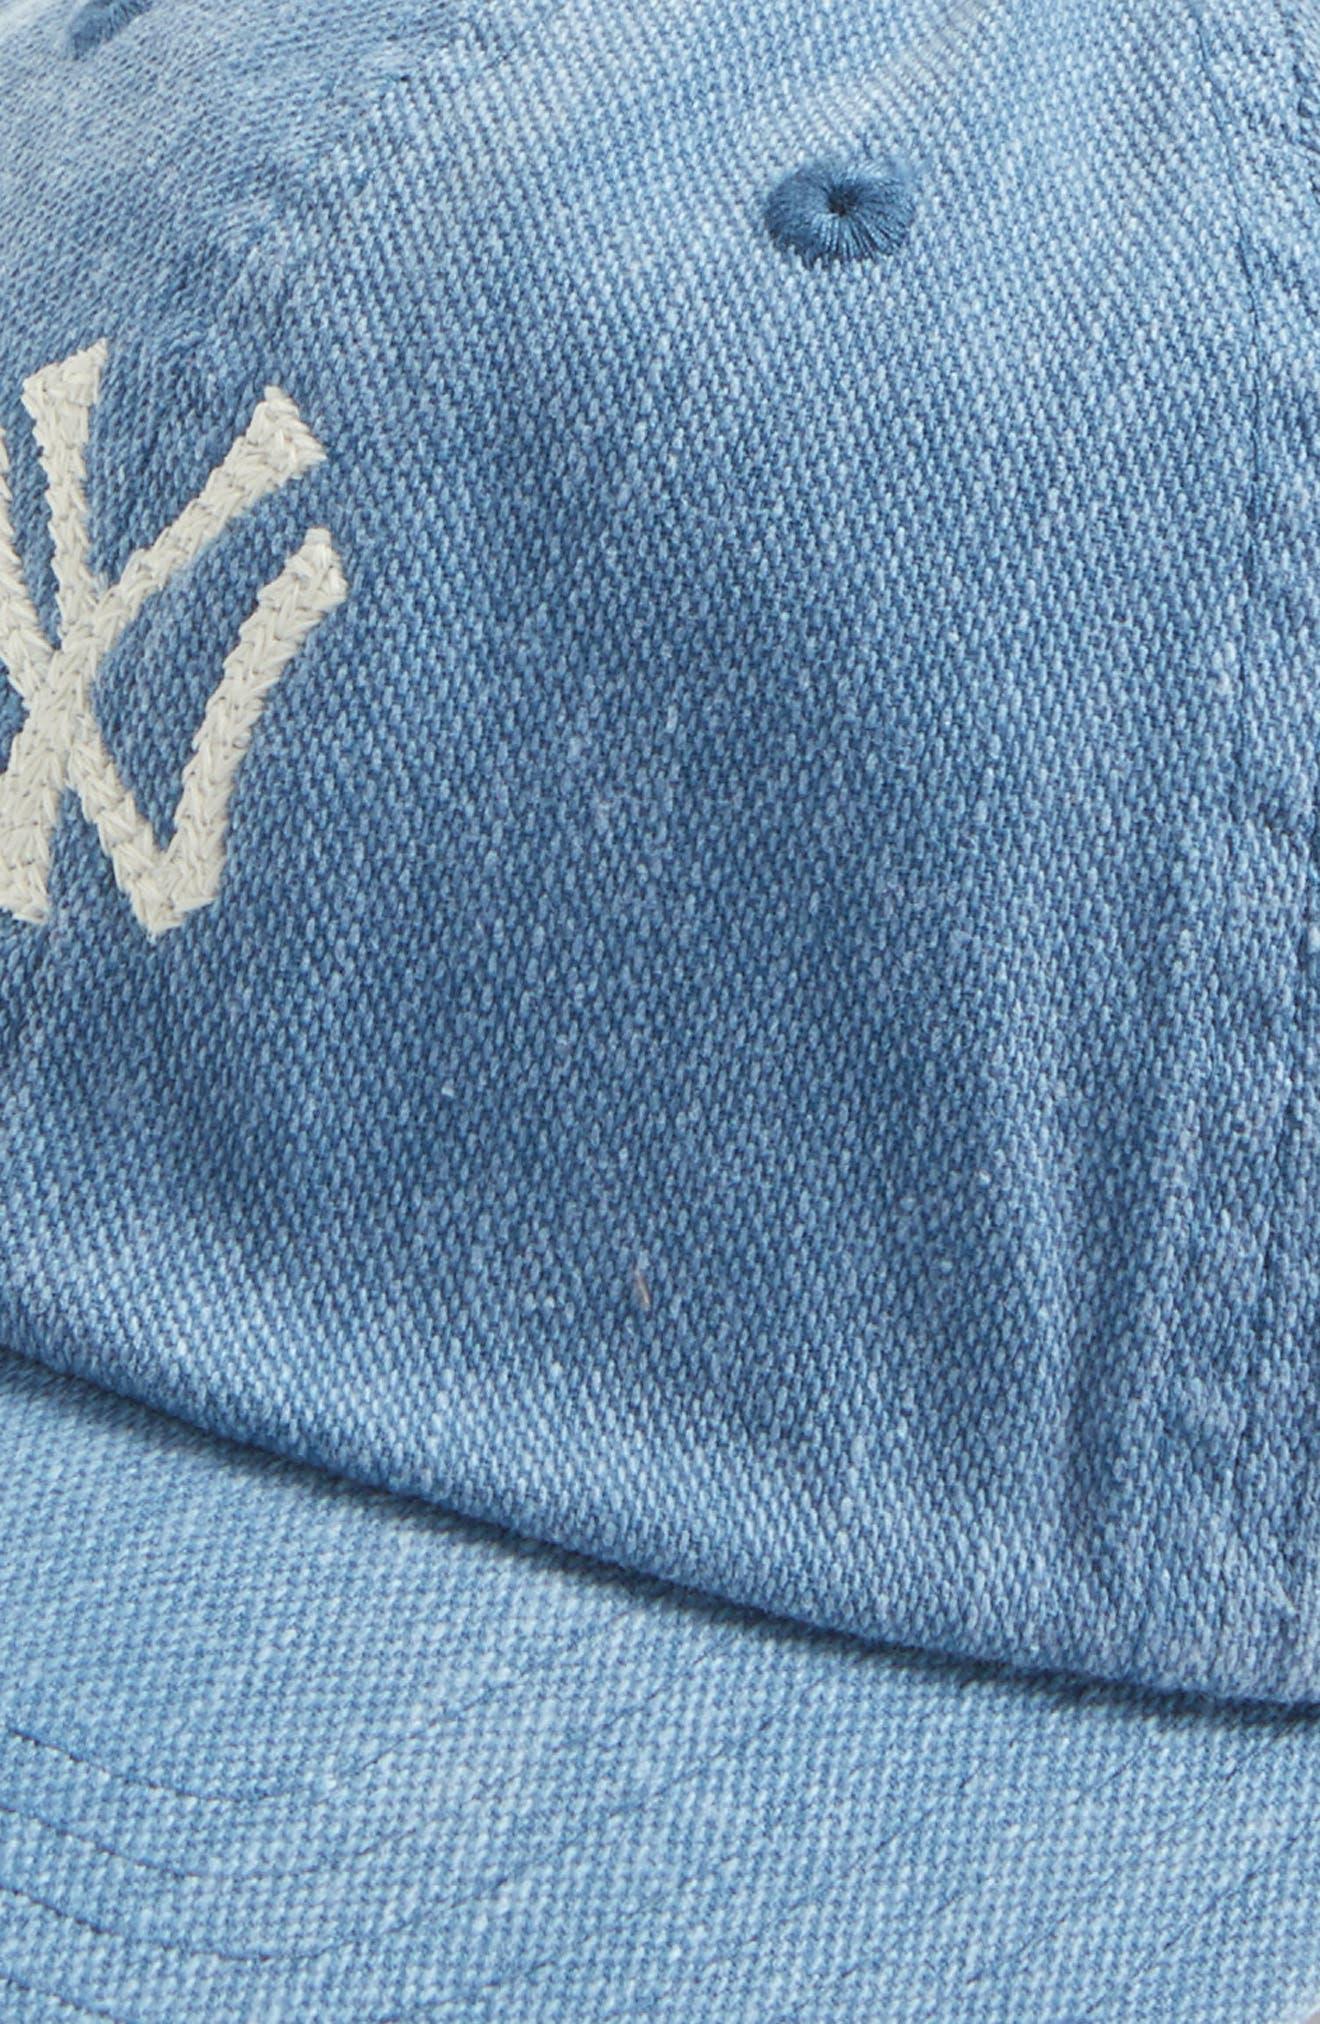 Alternate Image 3  - American Needle Danbury New York Yankees Baseball Cap